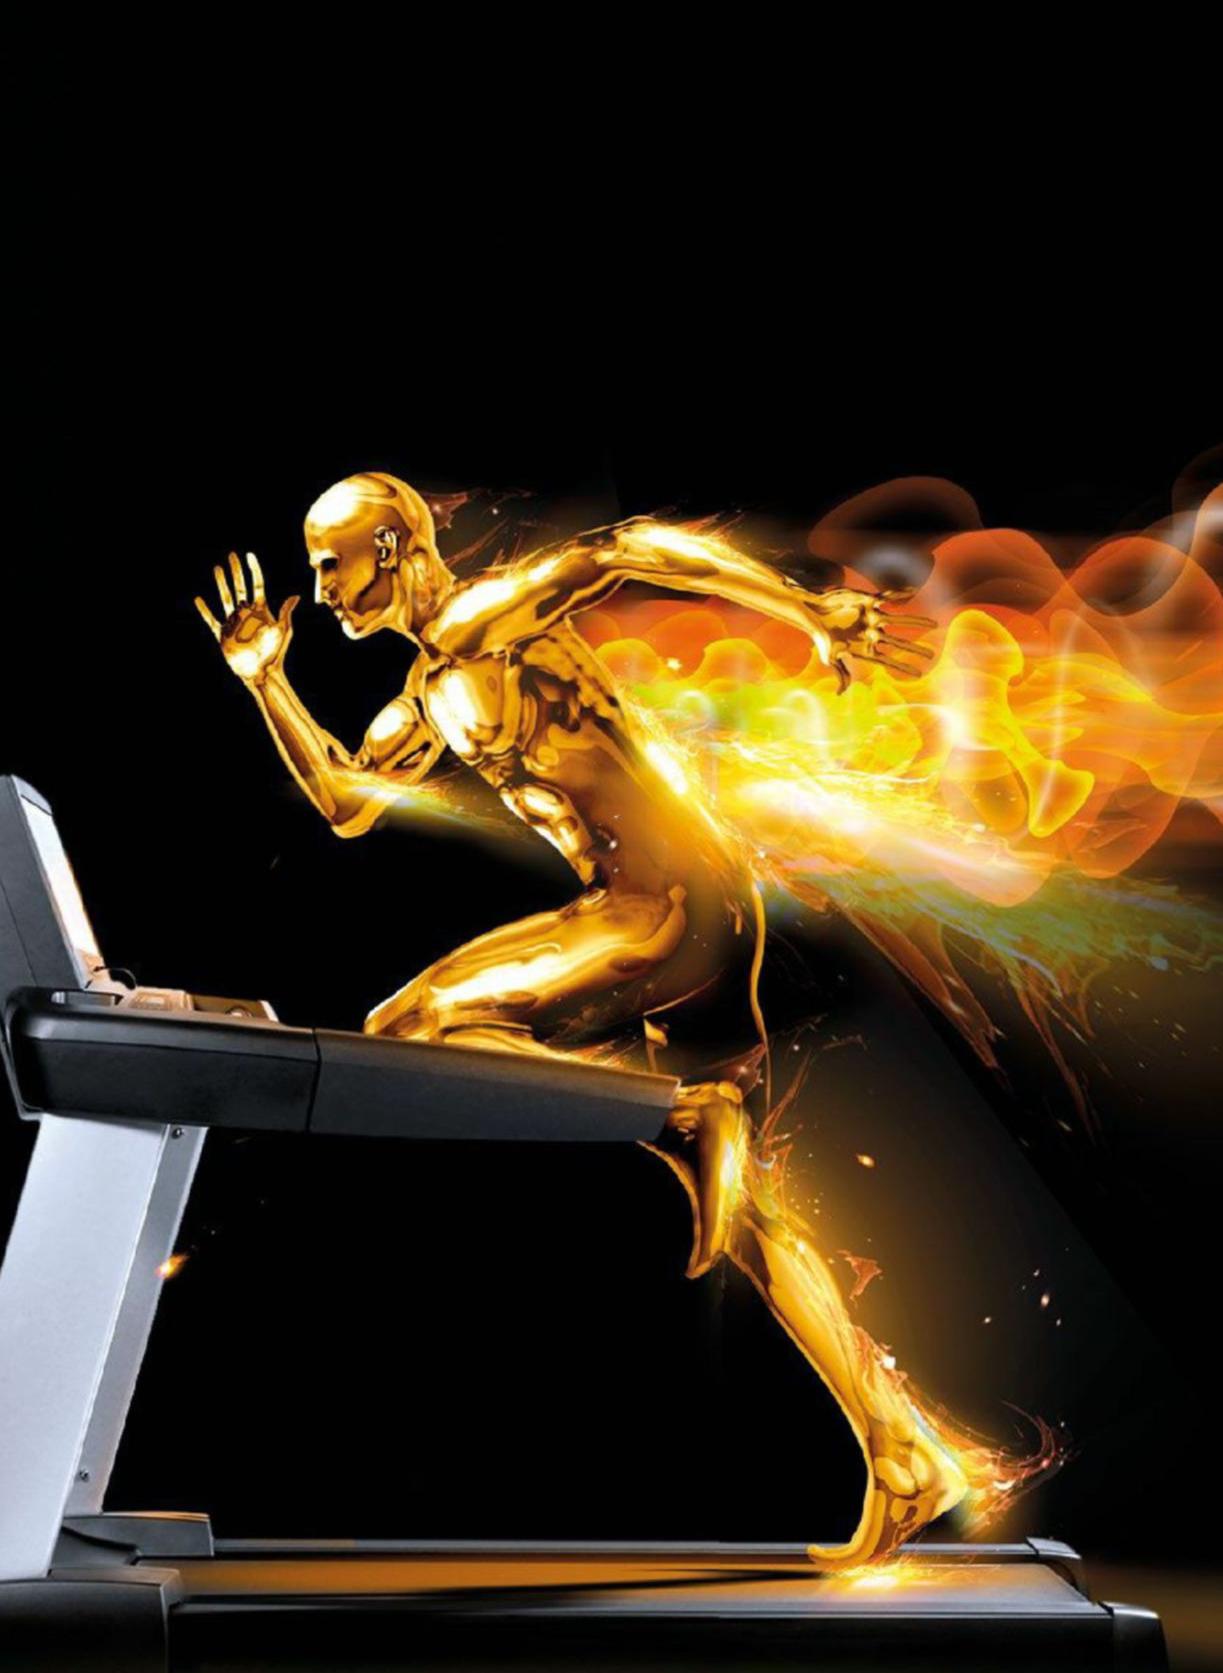 Burn 1500 Calories Without Exercising!